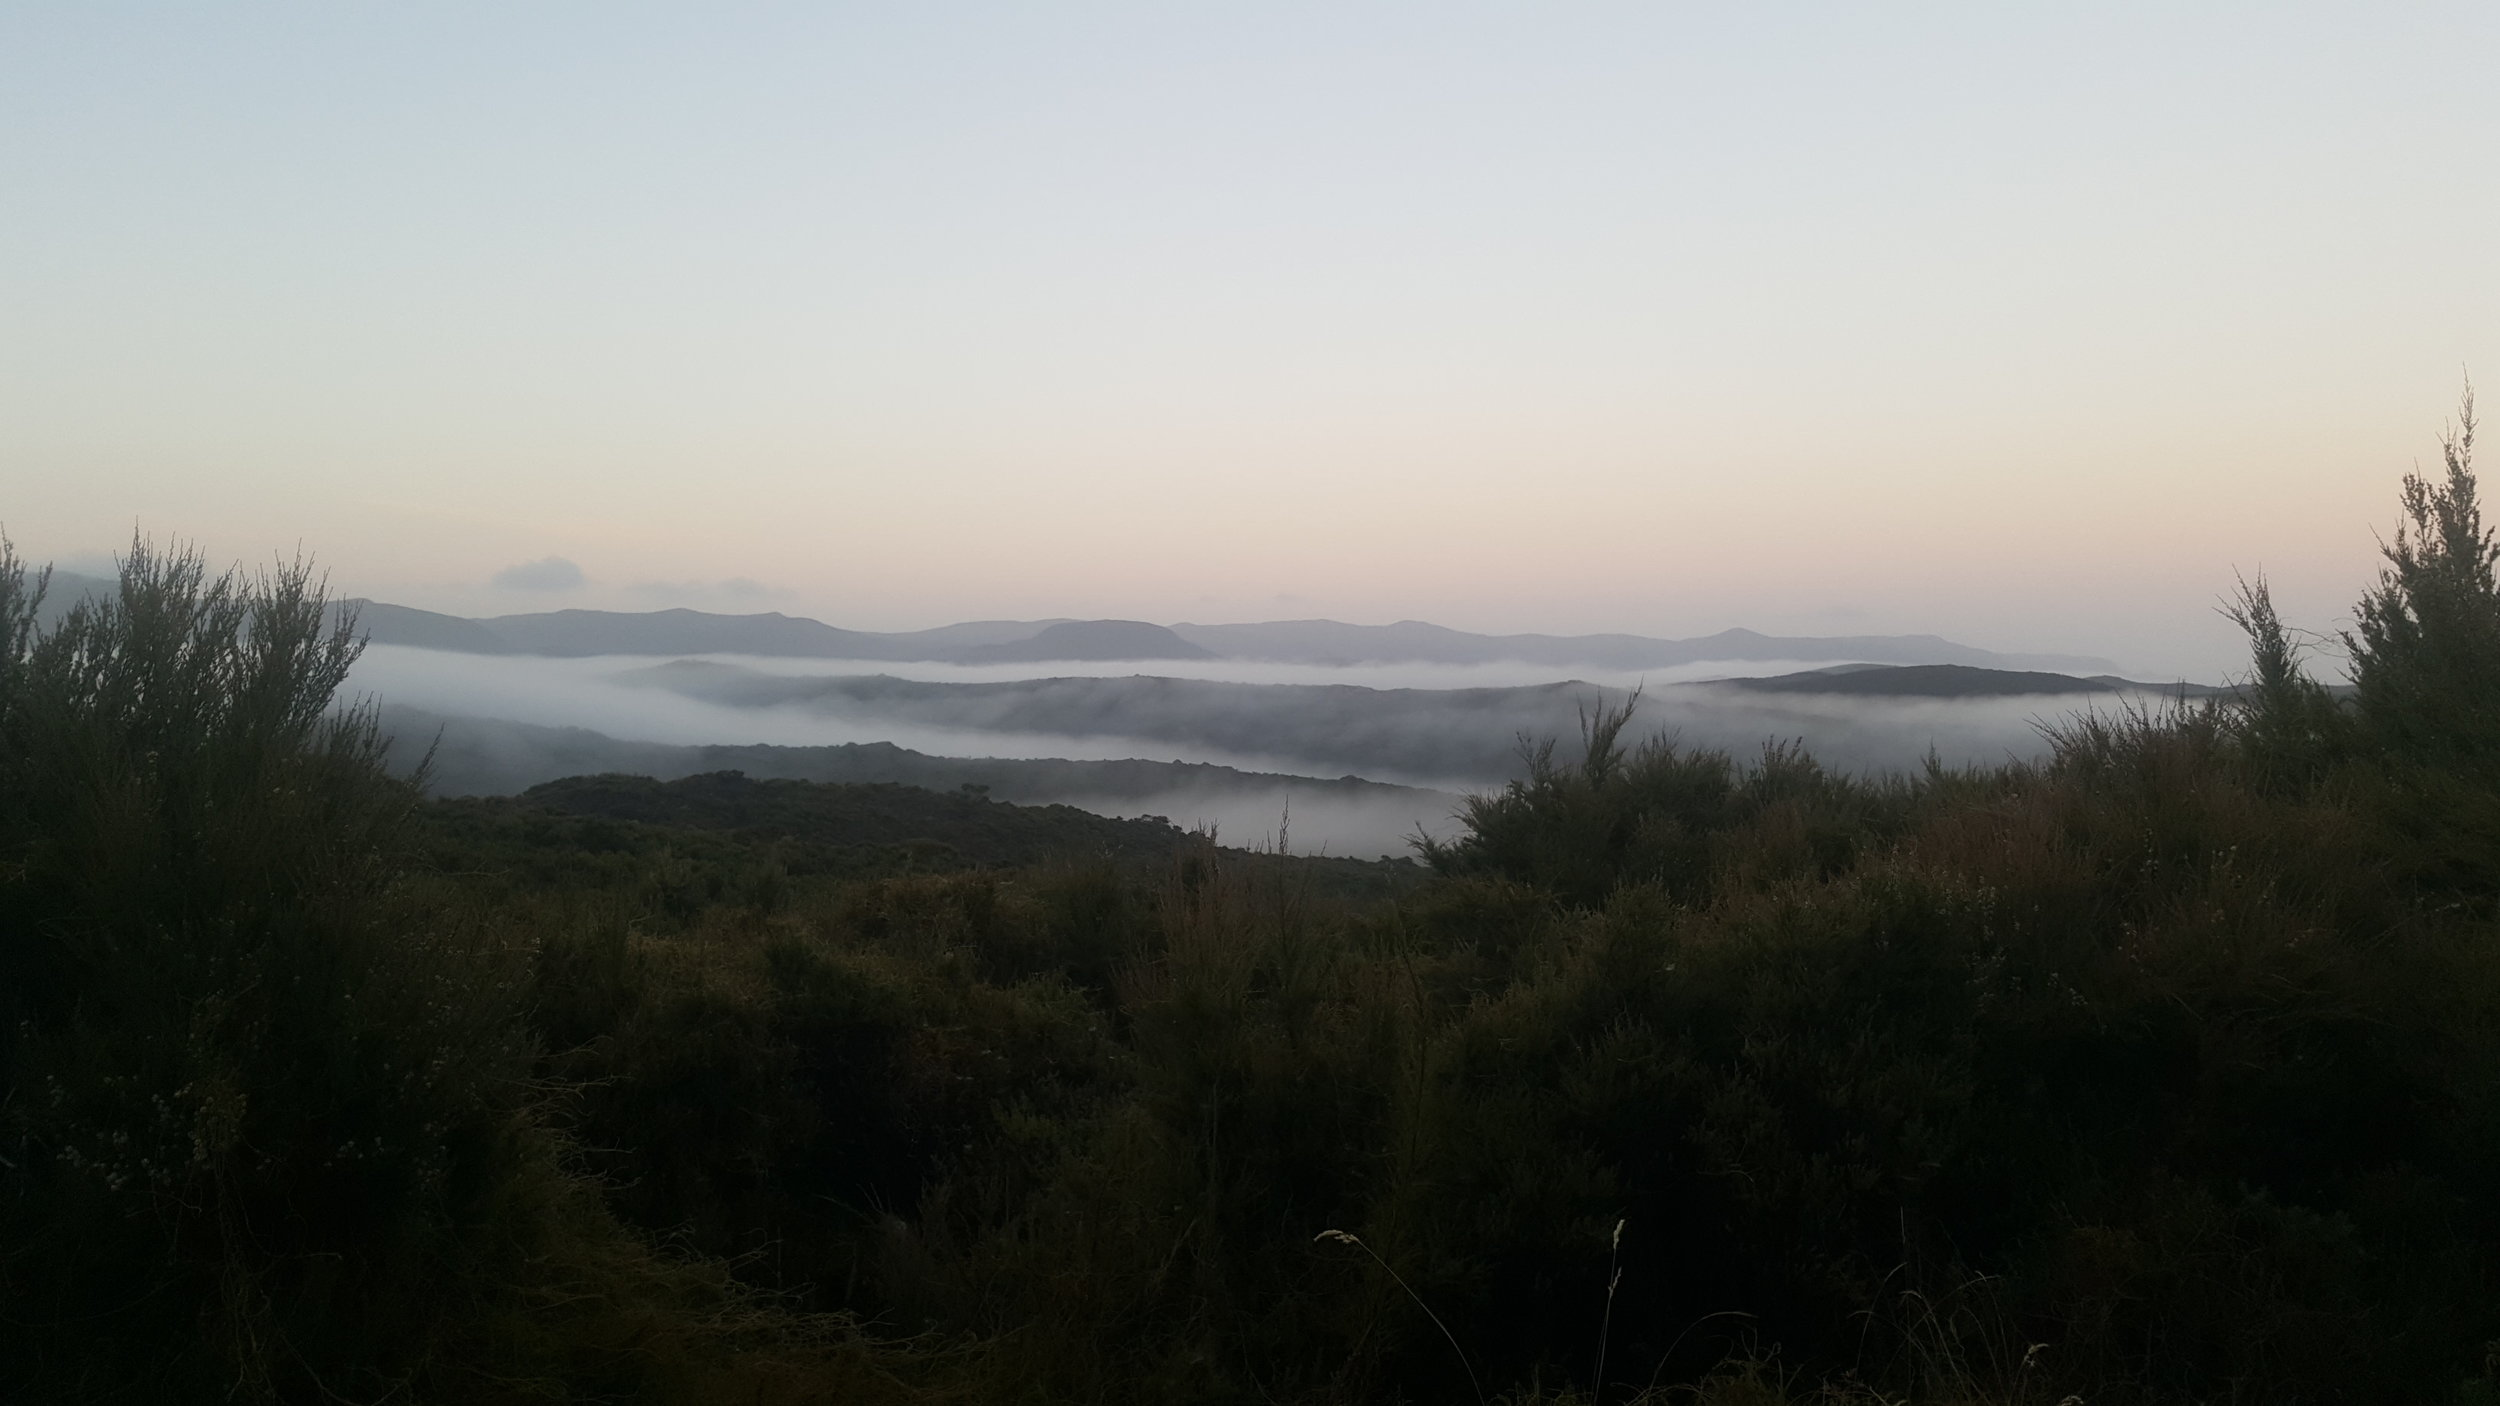 Aoteoroa. The land of the long white cloud.